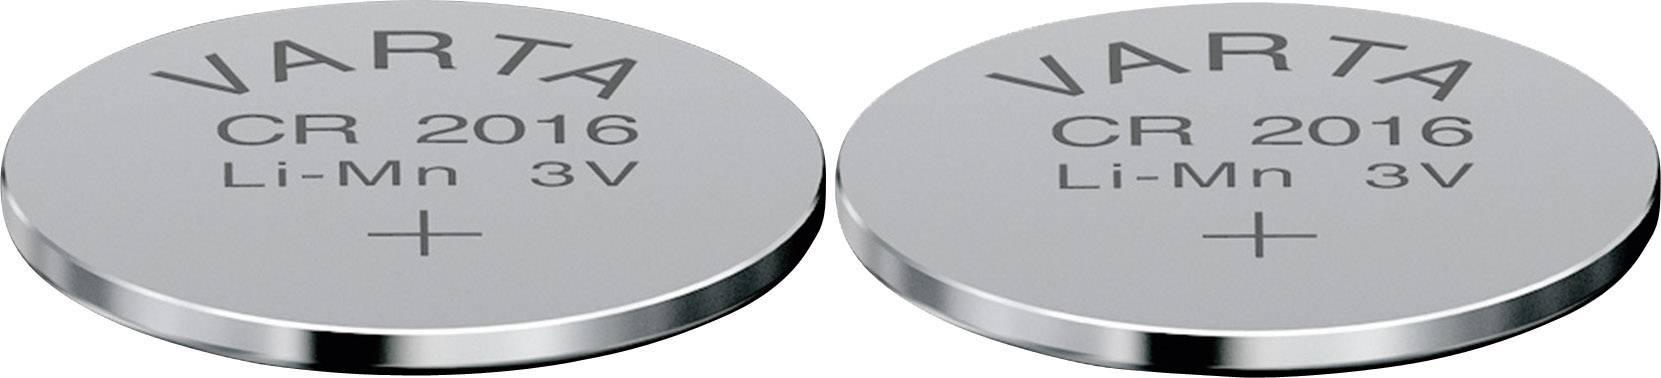 Gombíková batéria Varta CR 2016, lítium, 2 ks, 6016101402